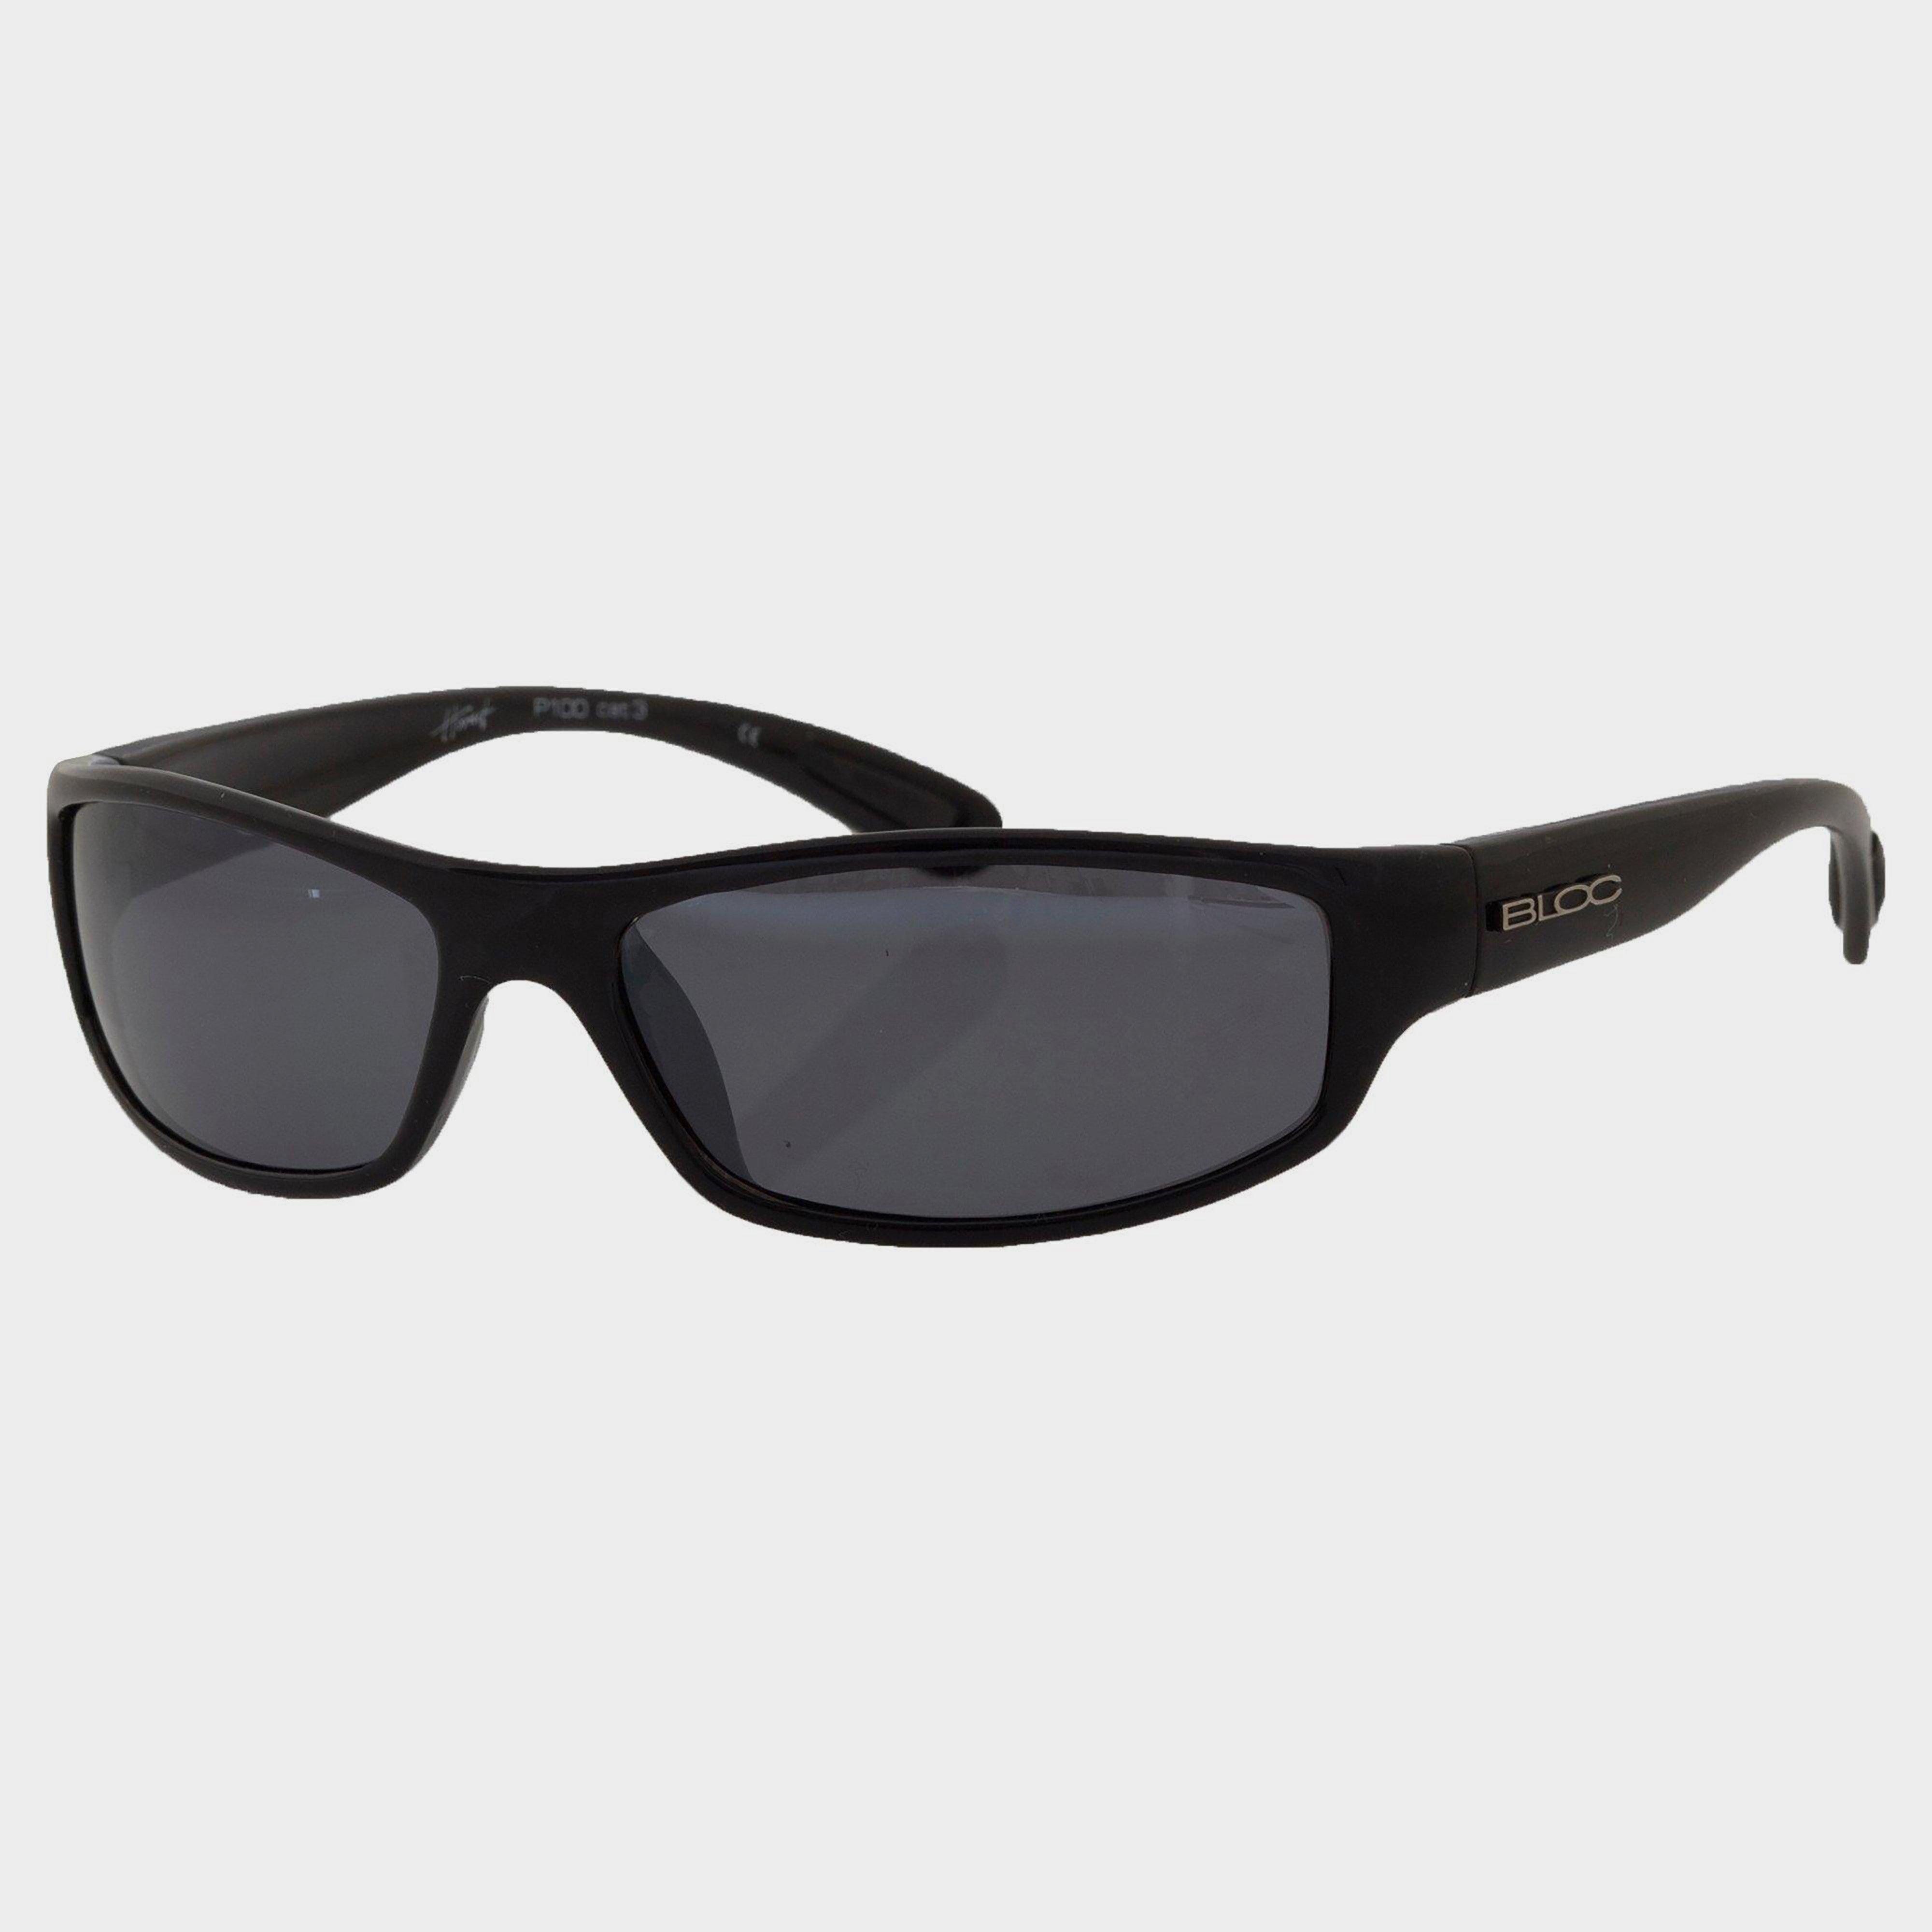 Bloc Hornet Polarised Sunglasses - Black/black  Black/black